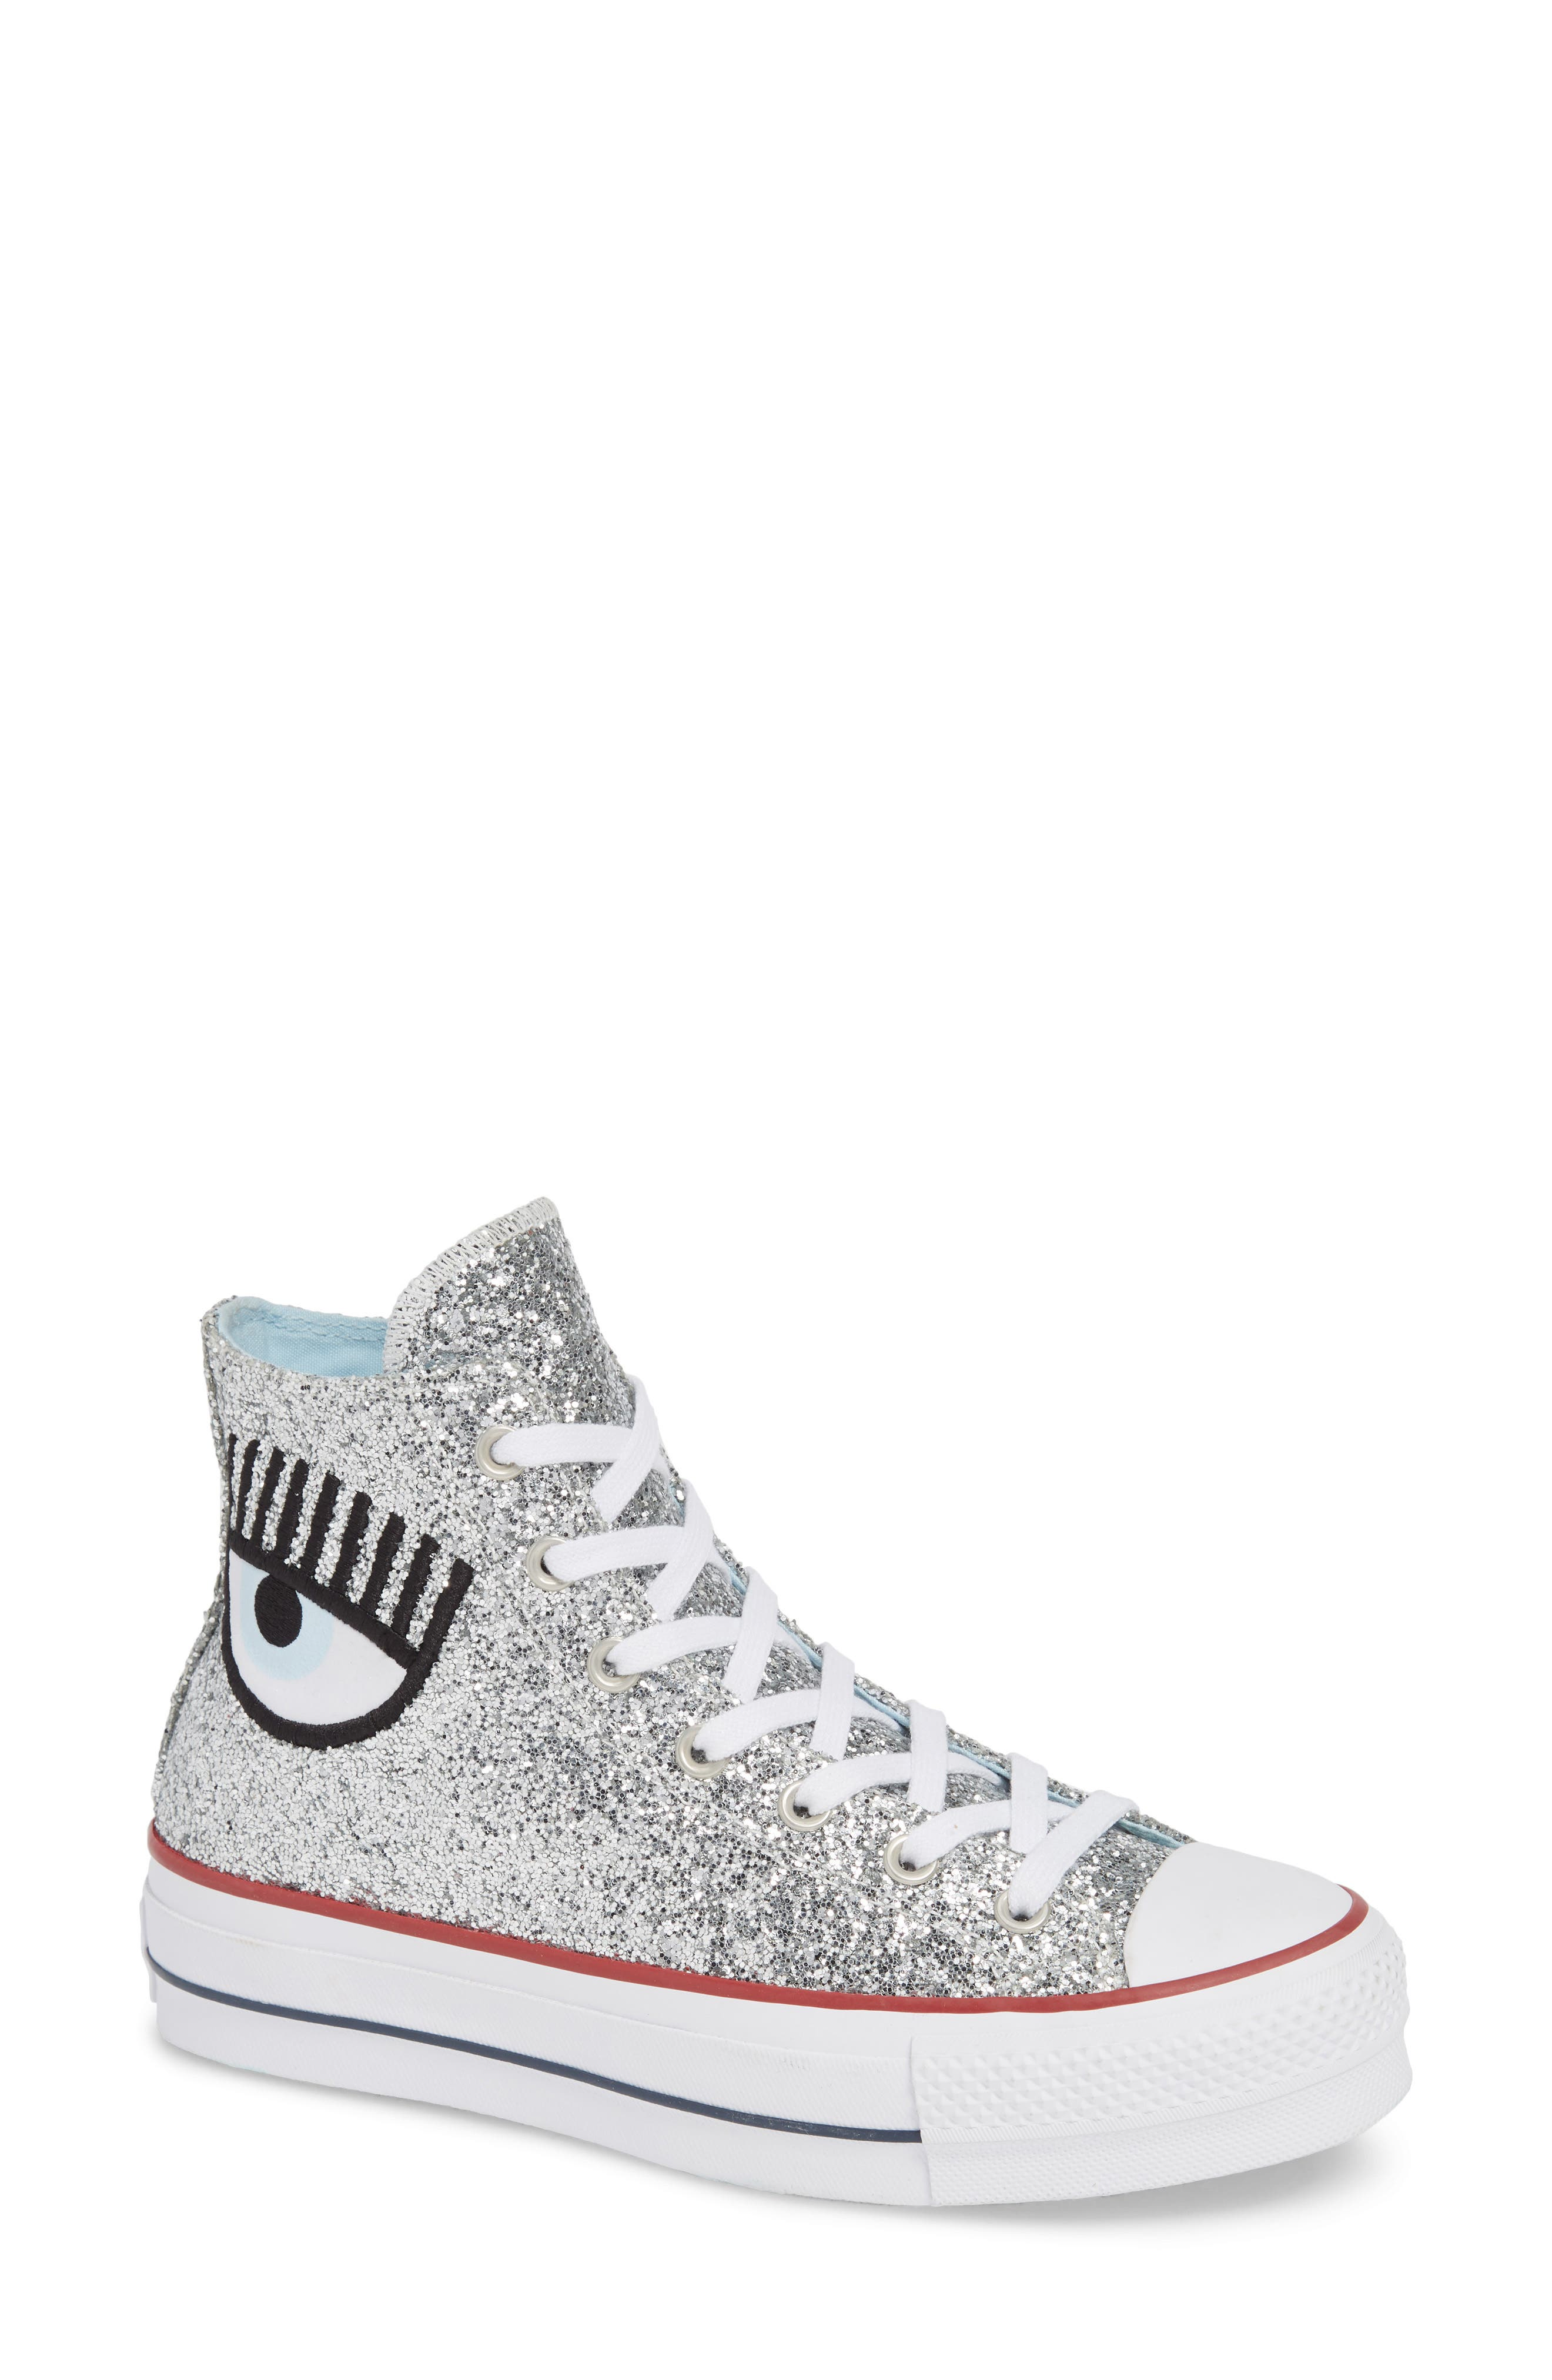 X Chiara Ferragni Women'S Chuck Taylor Glitter High Top Sneakers in Silver Glitter